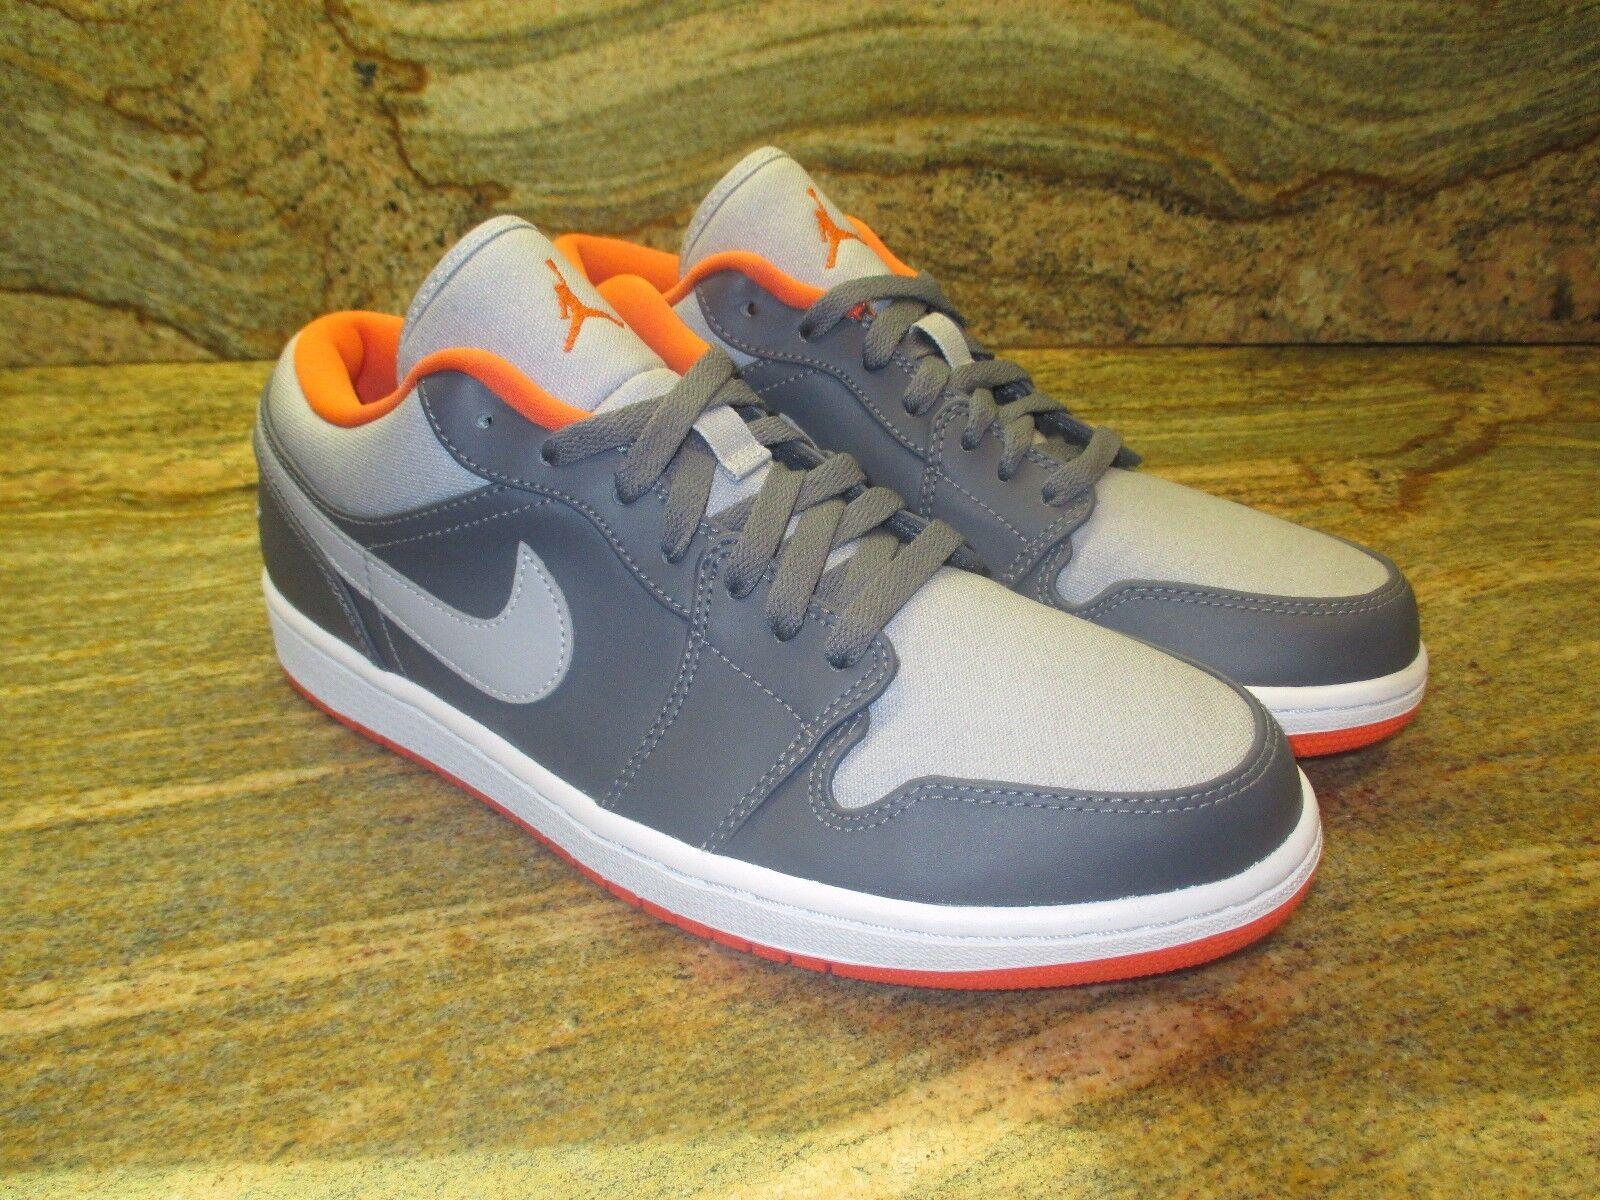 UNRELEASED Nike Air Jordan 1 Retro Low Pigeon Sample SZ 9 Dunk SB Promo PE OG